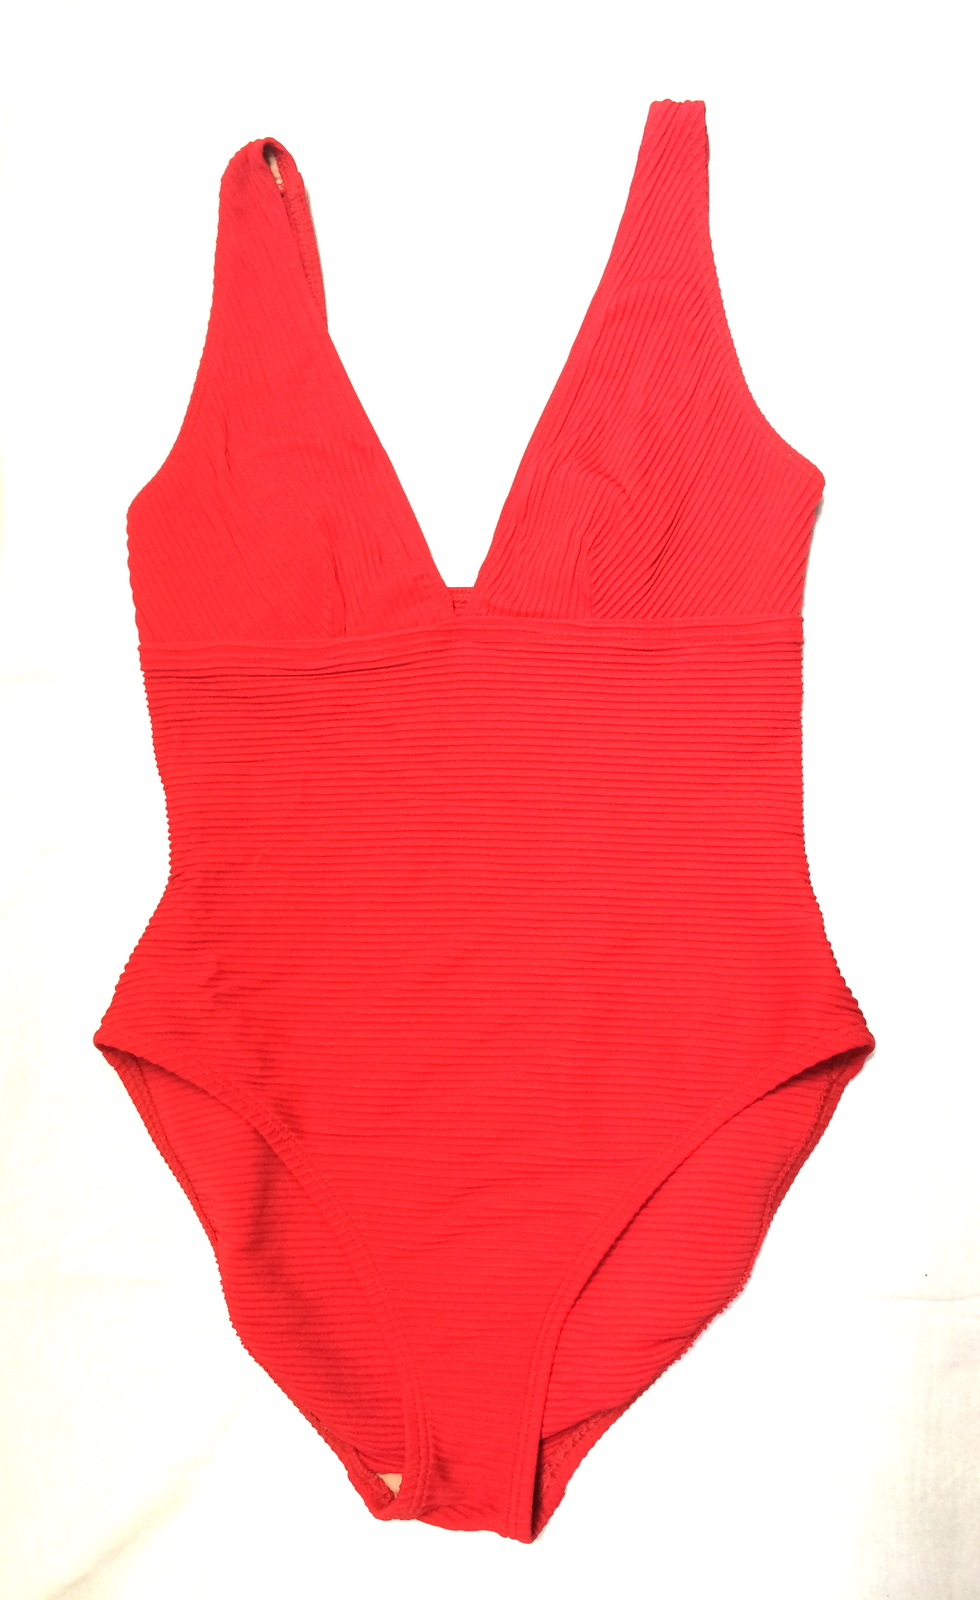 9783d57bf9 La Blanca Rod Beattie One Piece Bathing Suit and 50 similar items